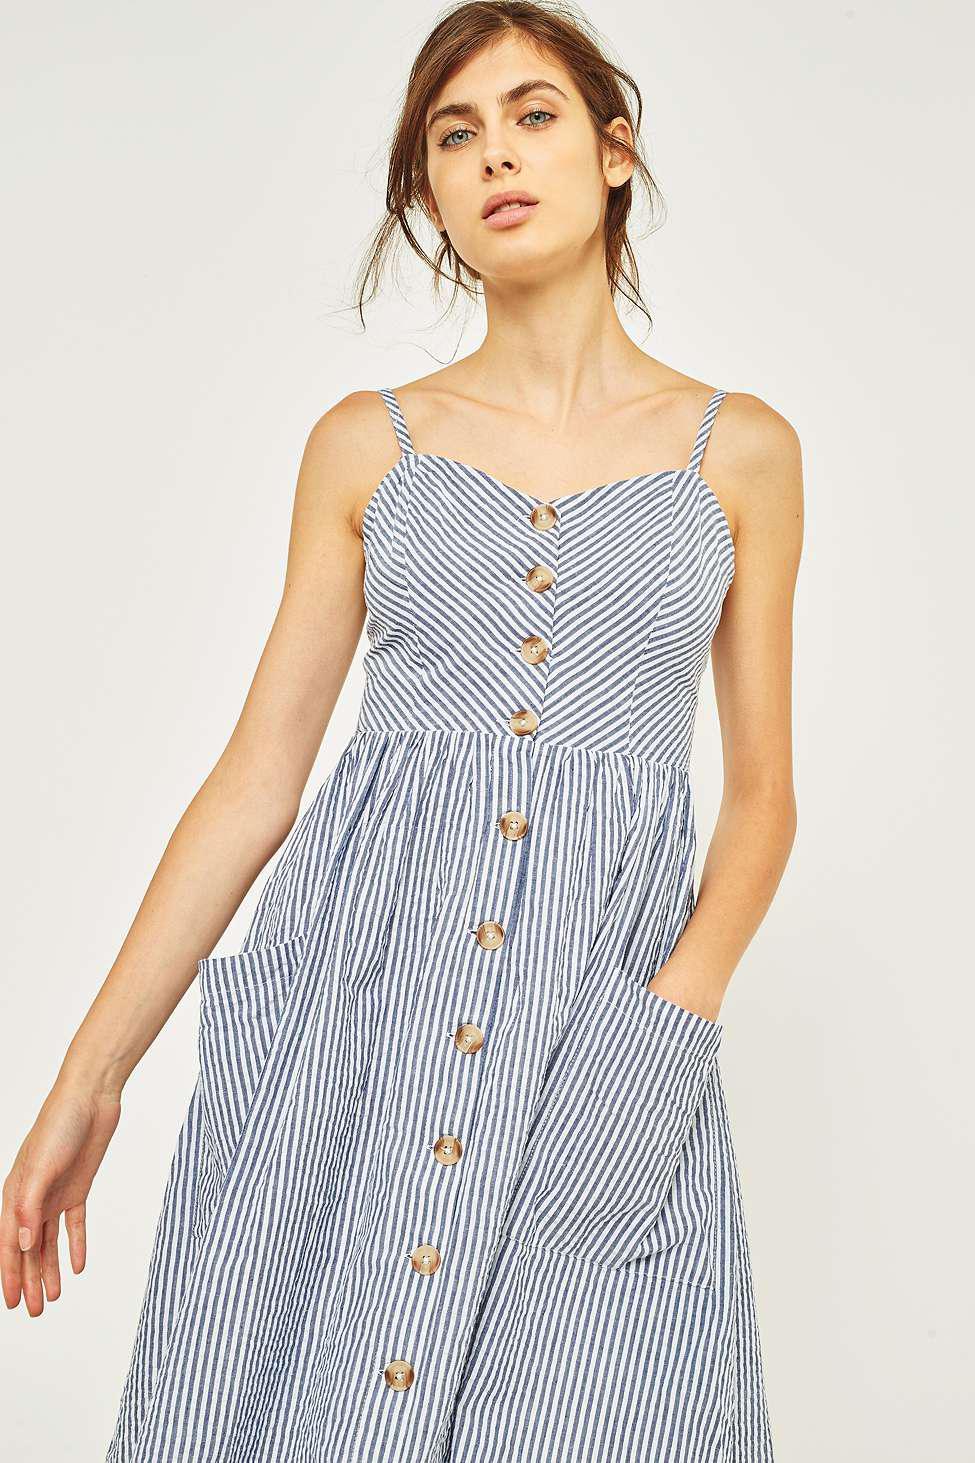 aaa9c76e44 Kimchi Blue Emilia Seersucker Linen Button-down Midi Dress - Womens ...